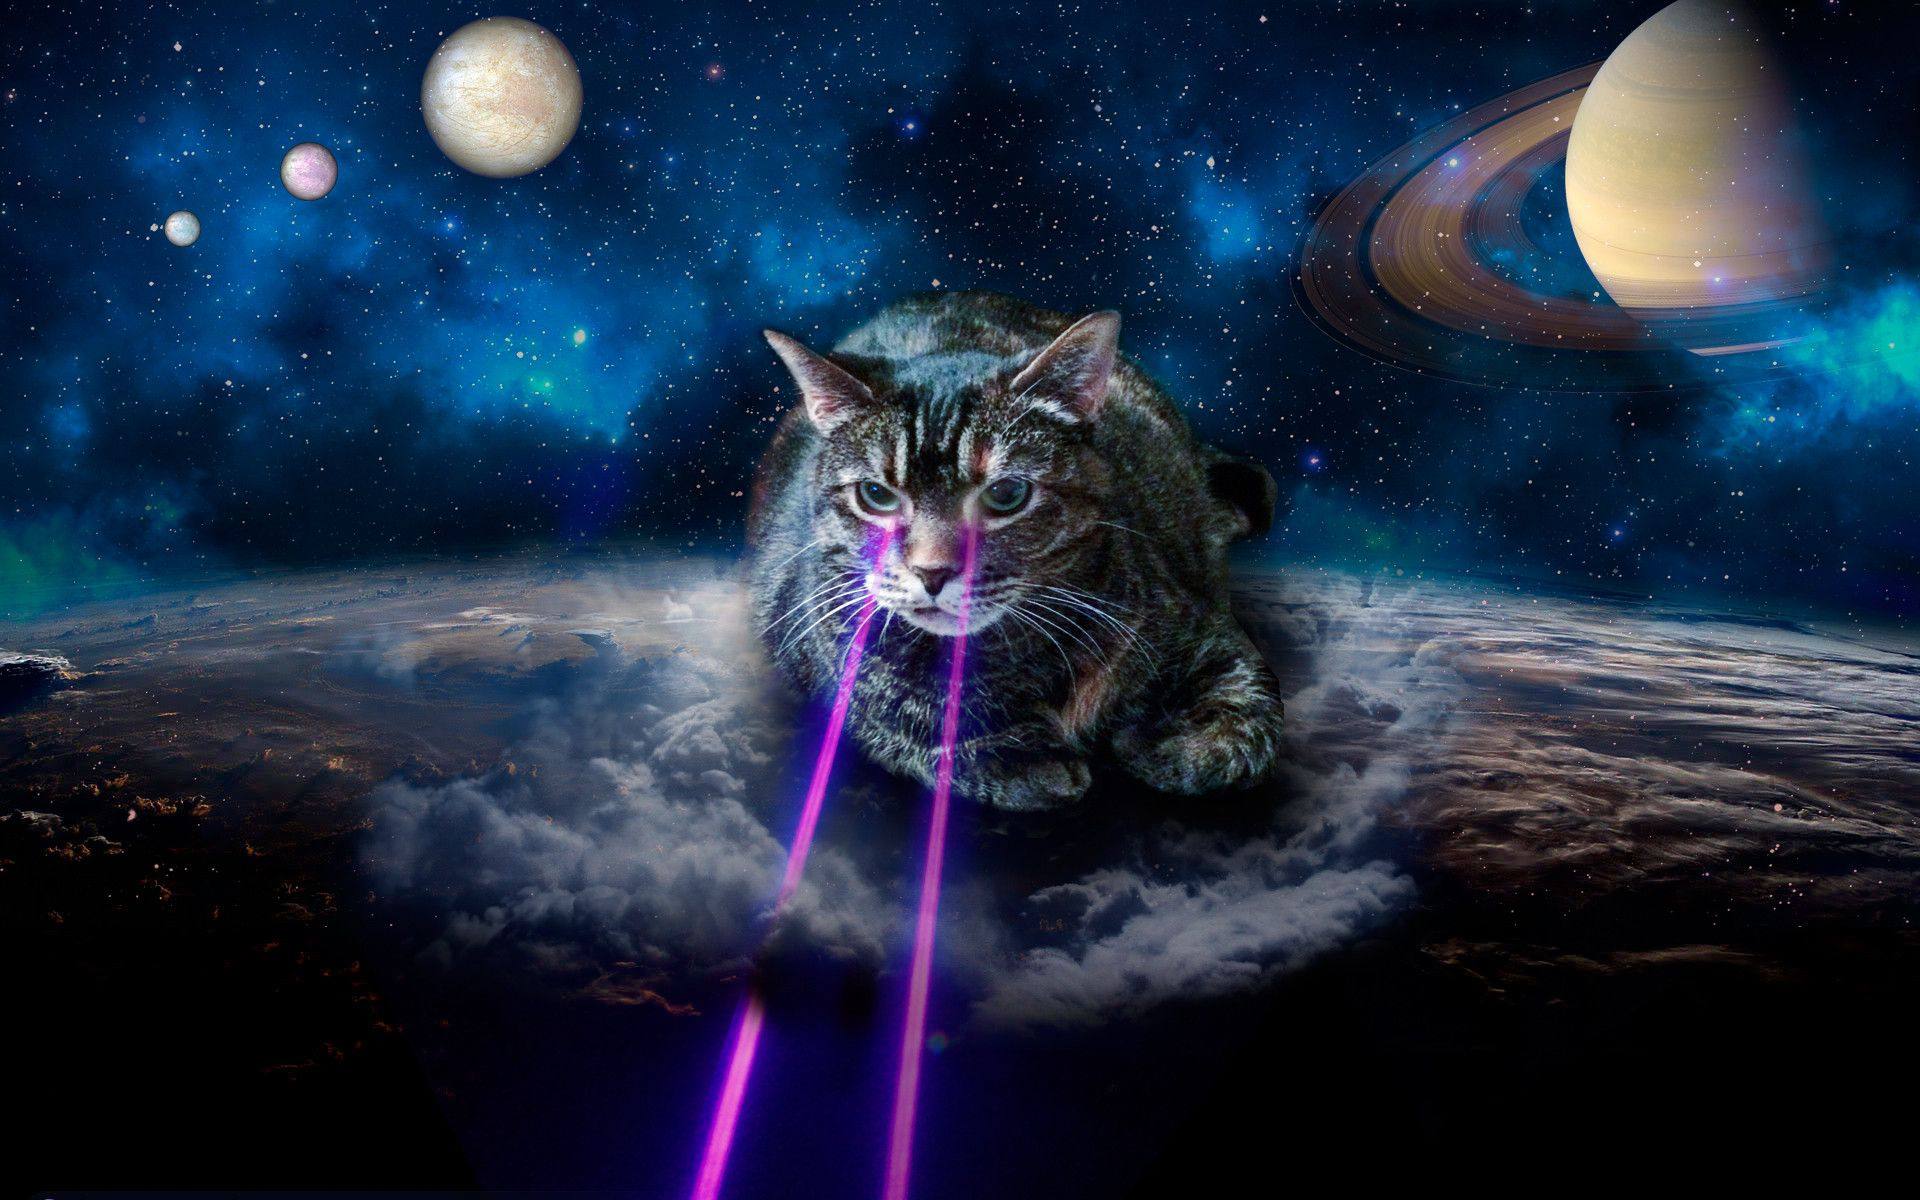 Cats In Space R Spacecats Astronaut Cat Cat Wallpaper Space Cat